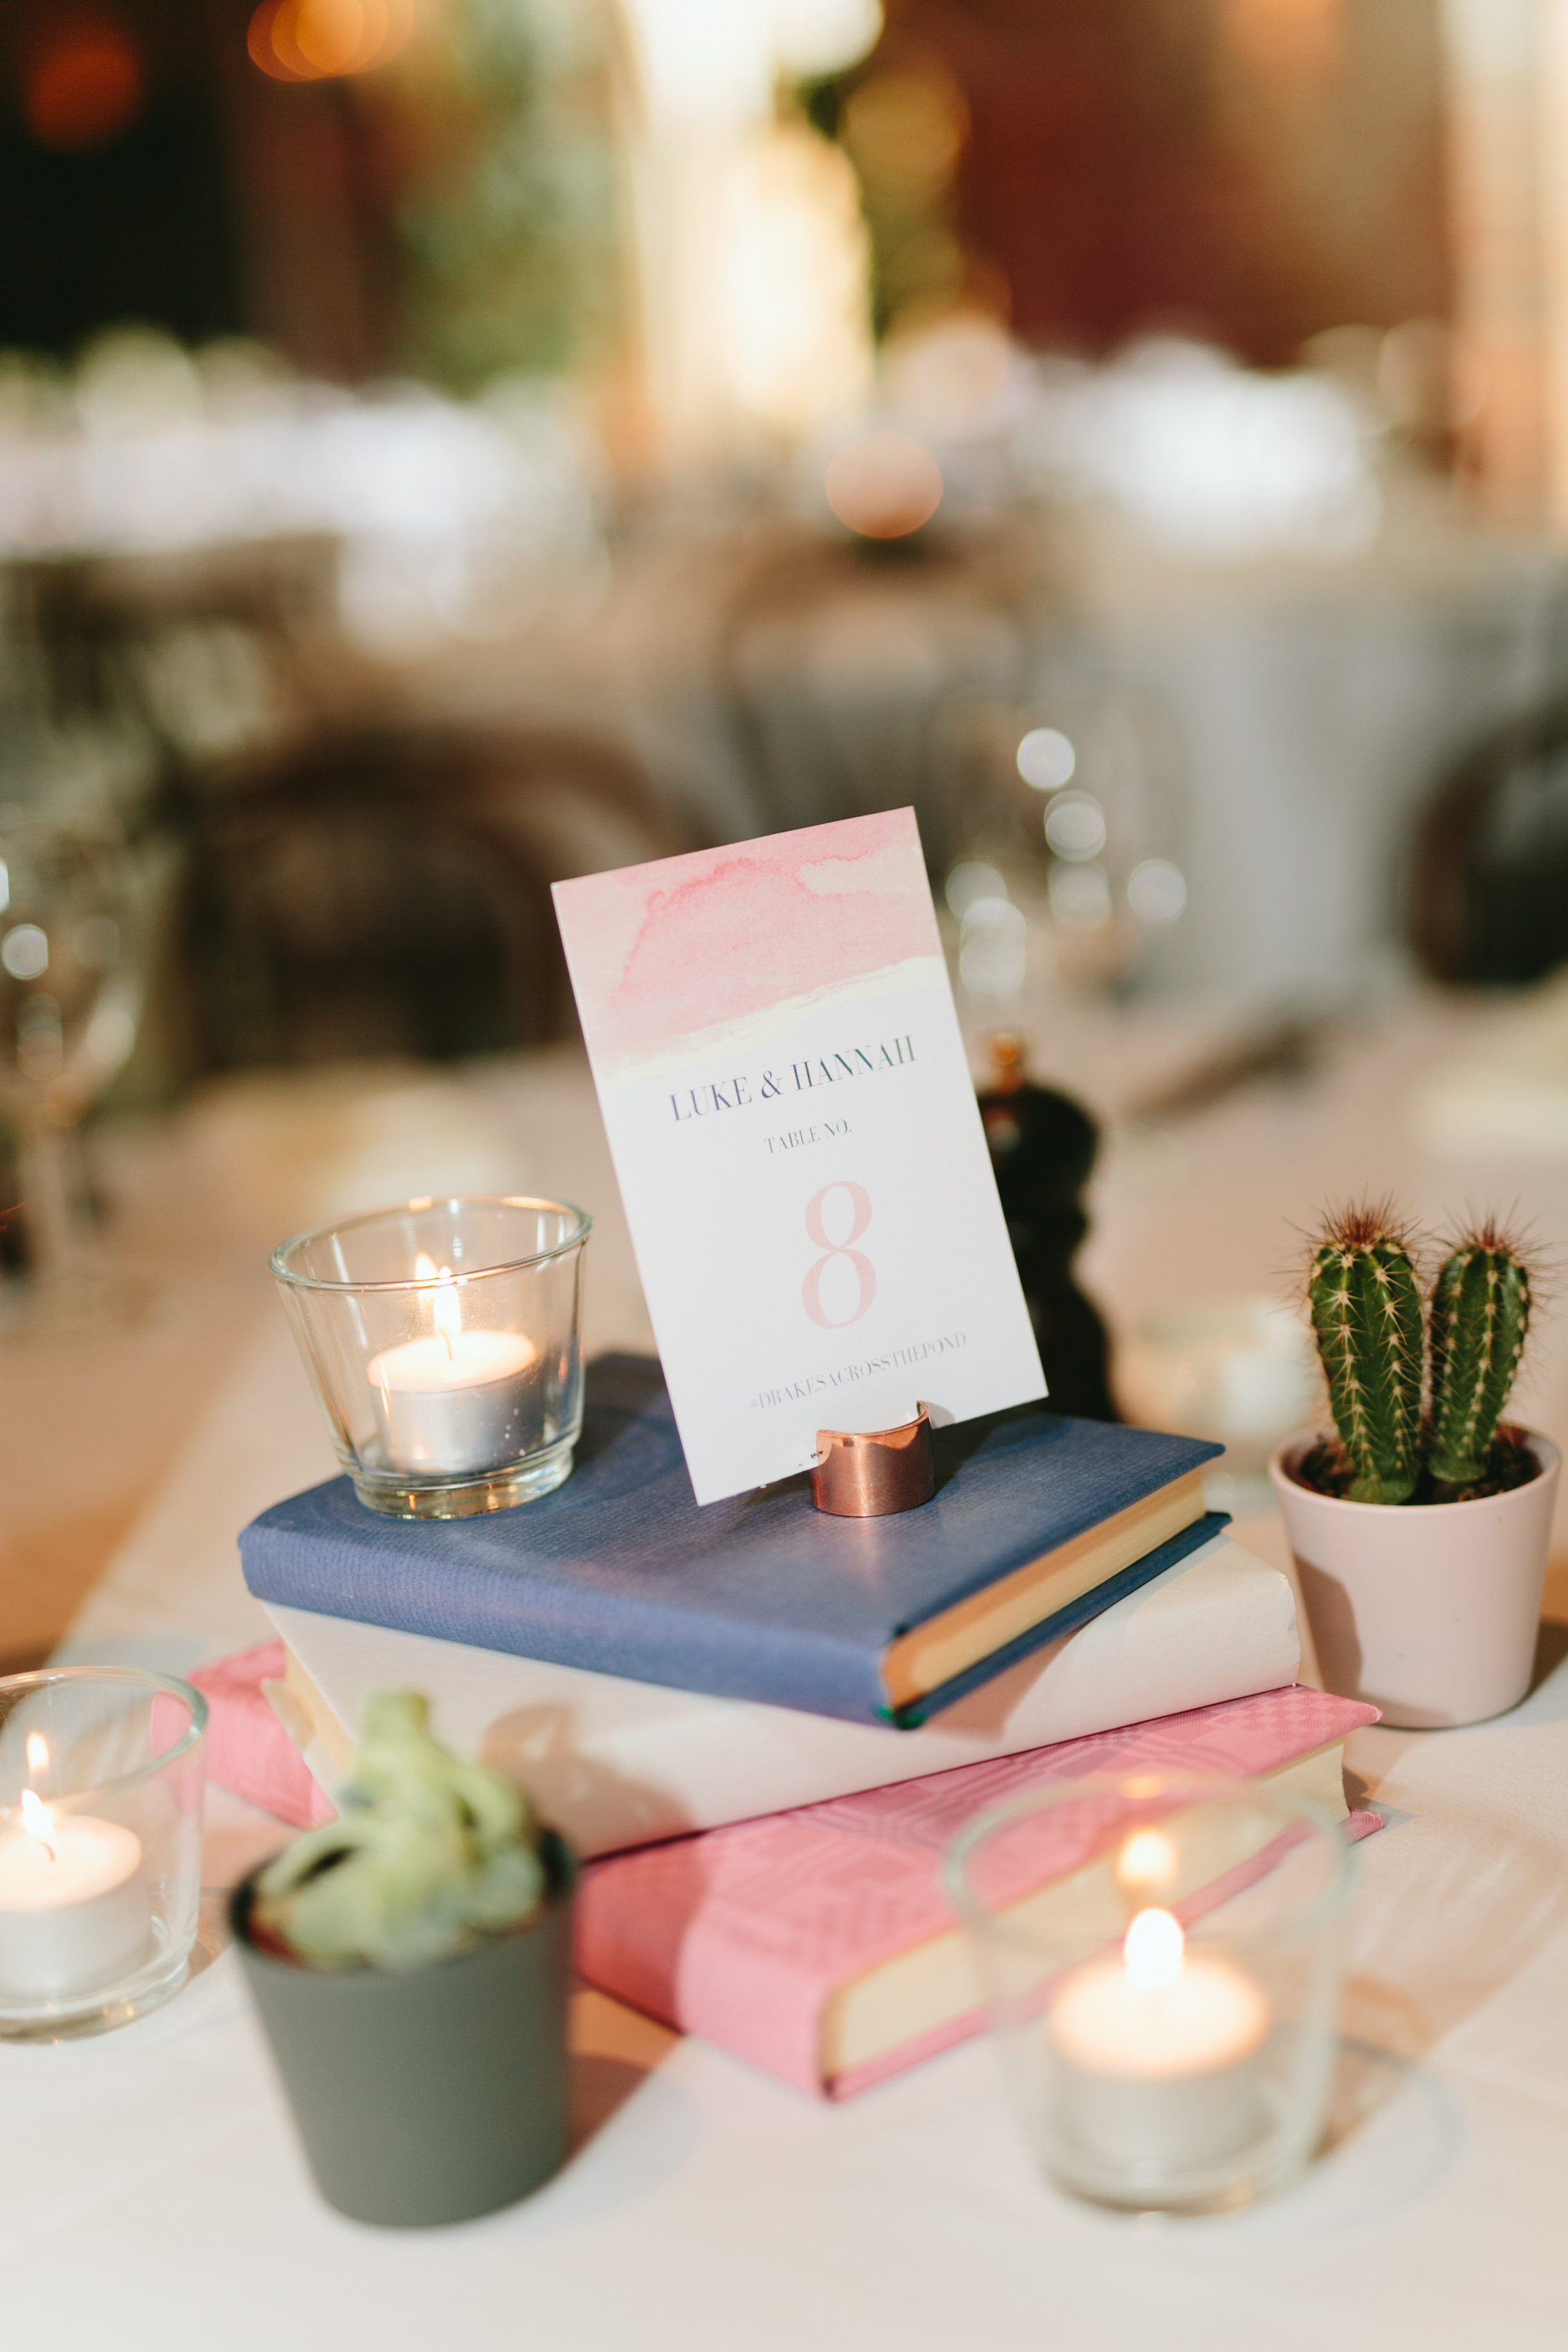 Wedding Decor - Table Numbers